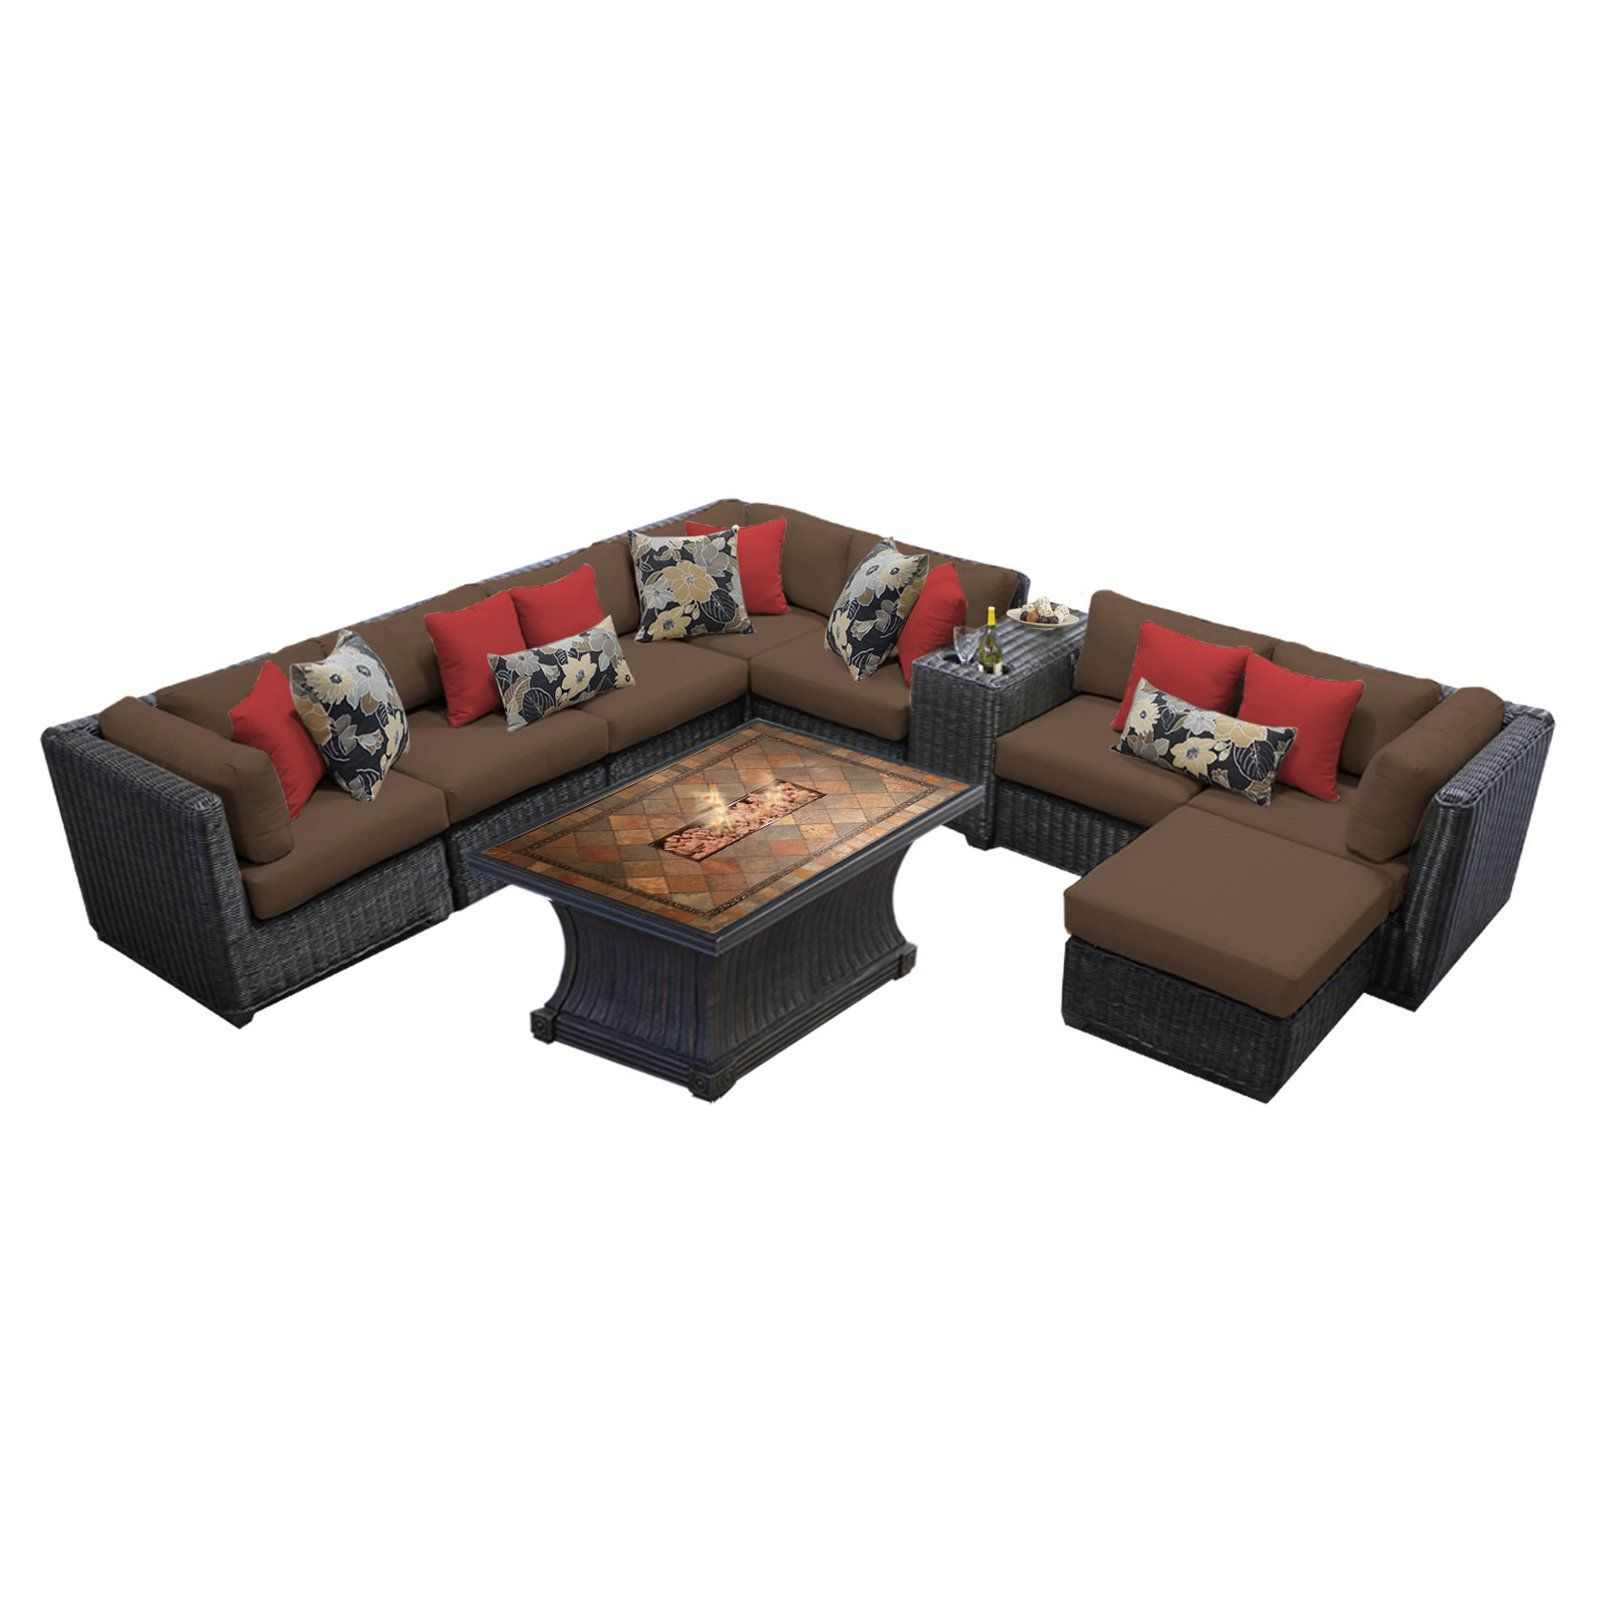 Admirable Tk Classics Venice 10 Piece Outdoor Sectional Set With Uwap Interior Chair Design Uwaporg